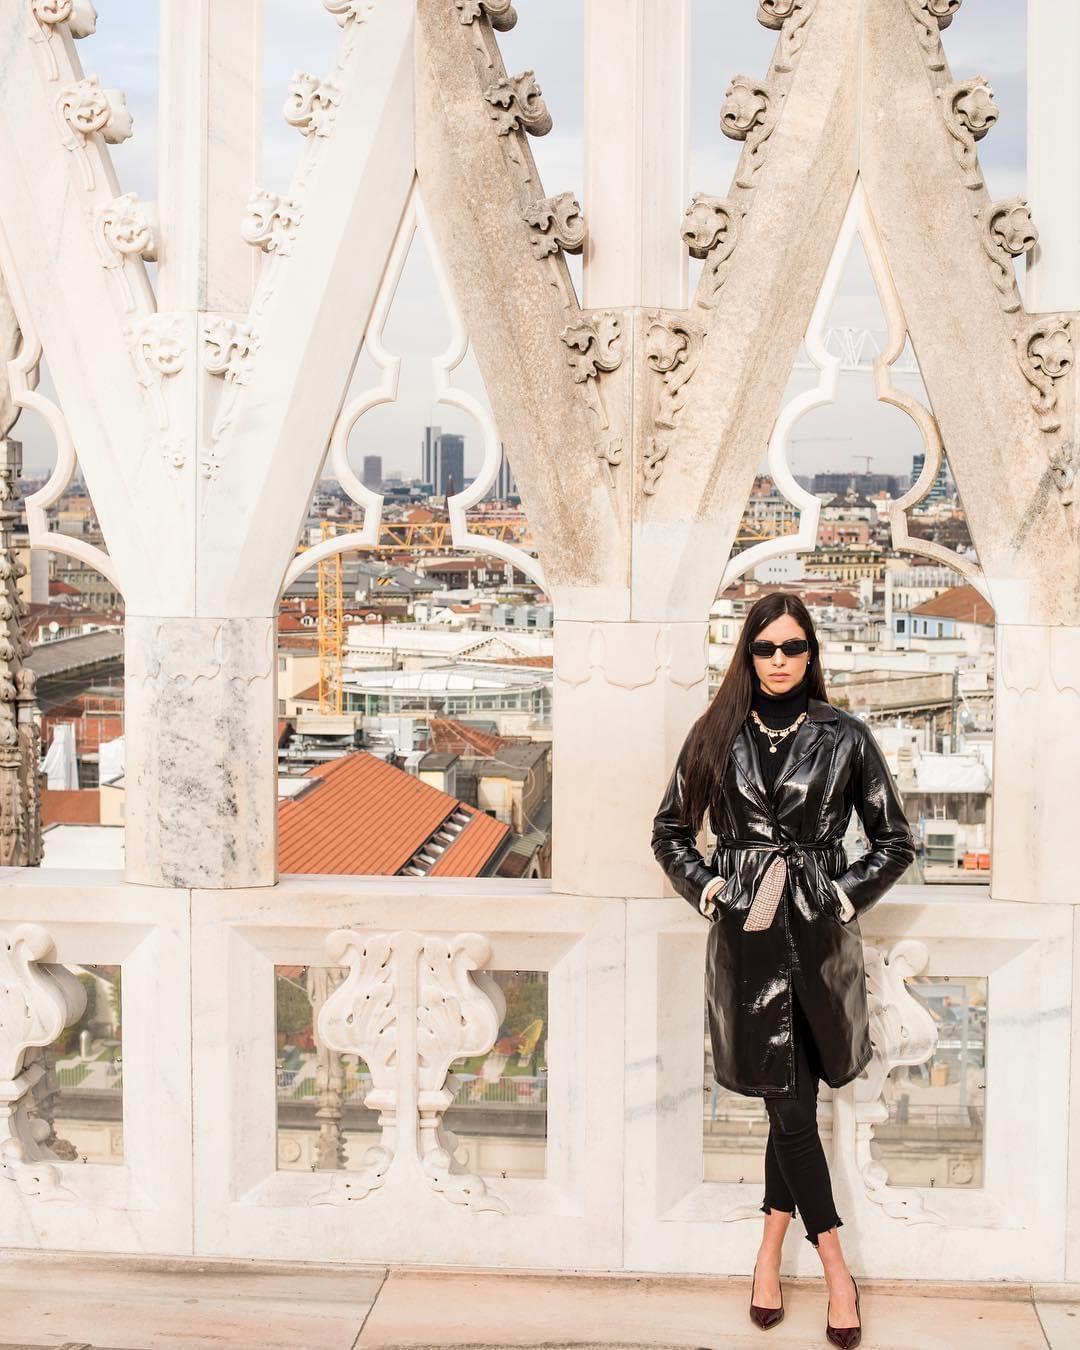 Eleonora Bernardi Zizola Reaches New Heights With Blog Womanpower